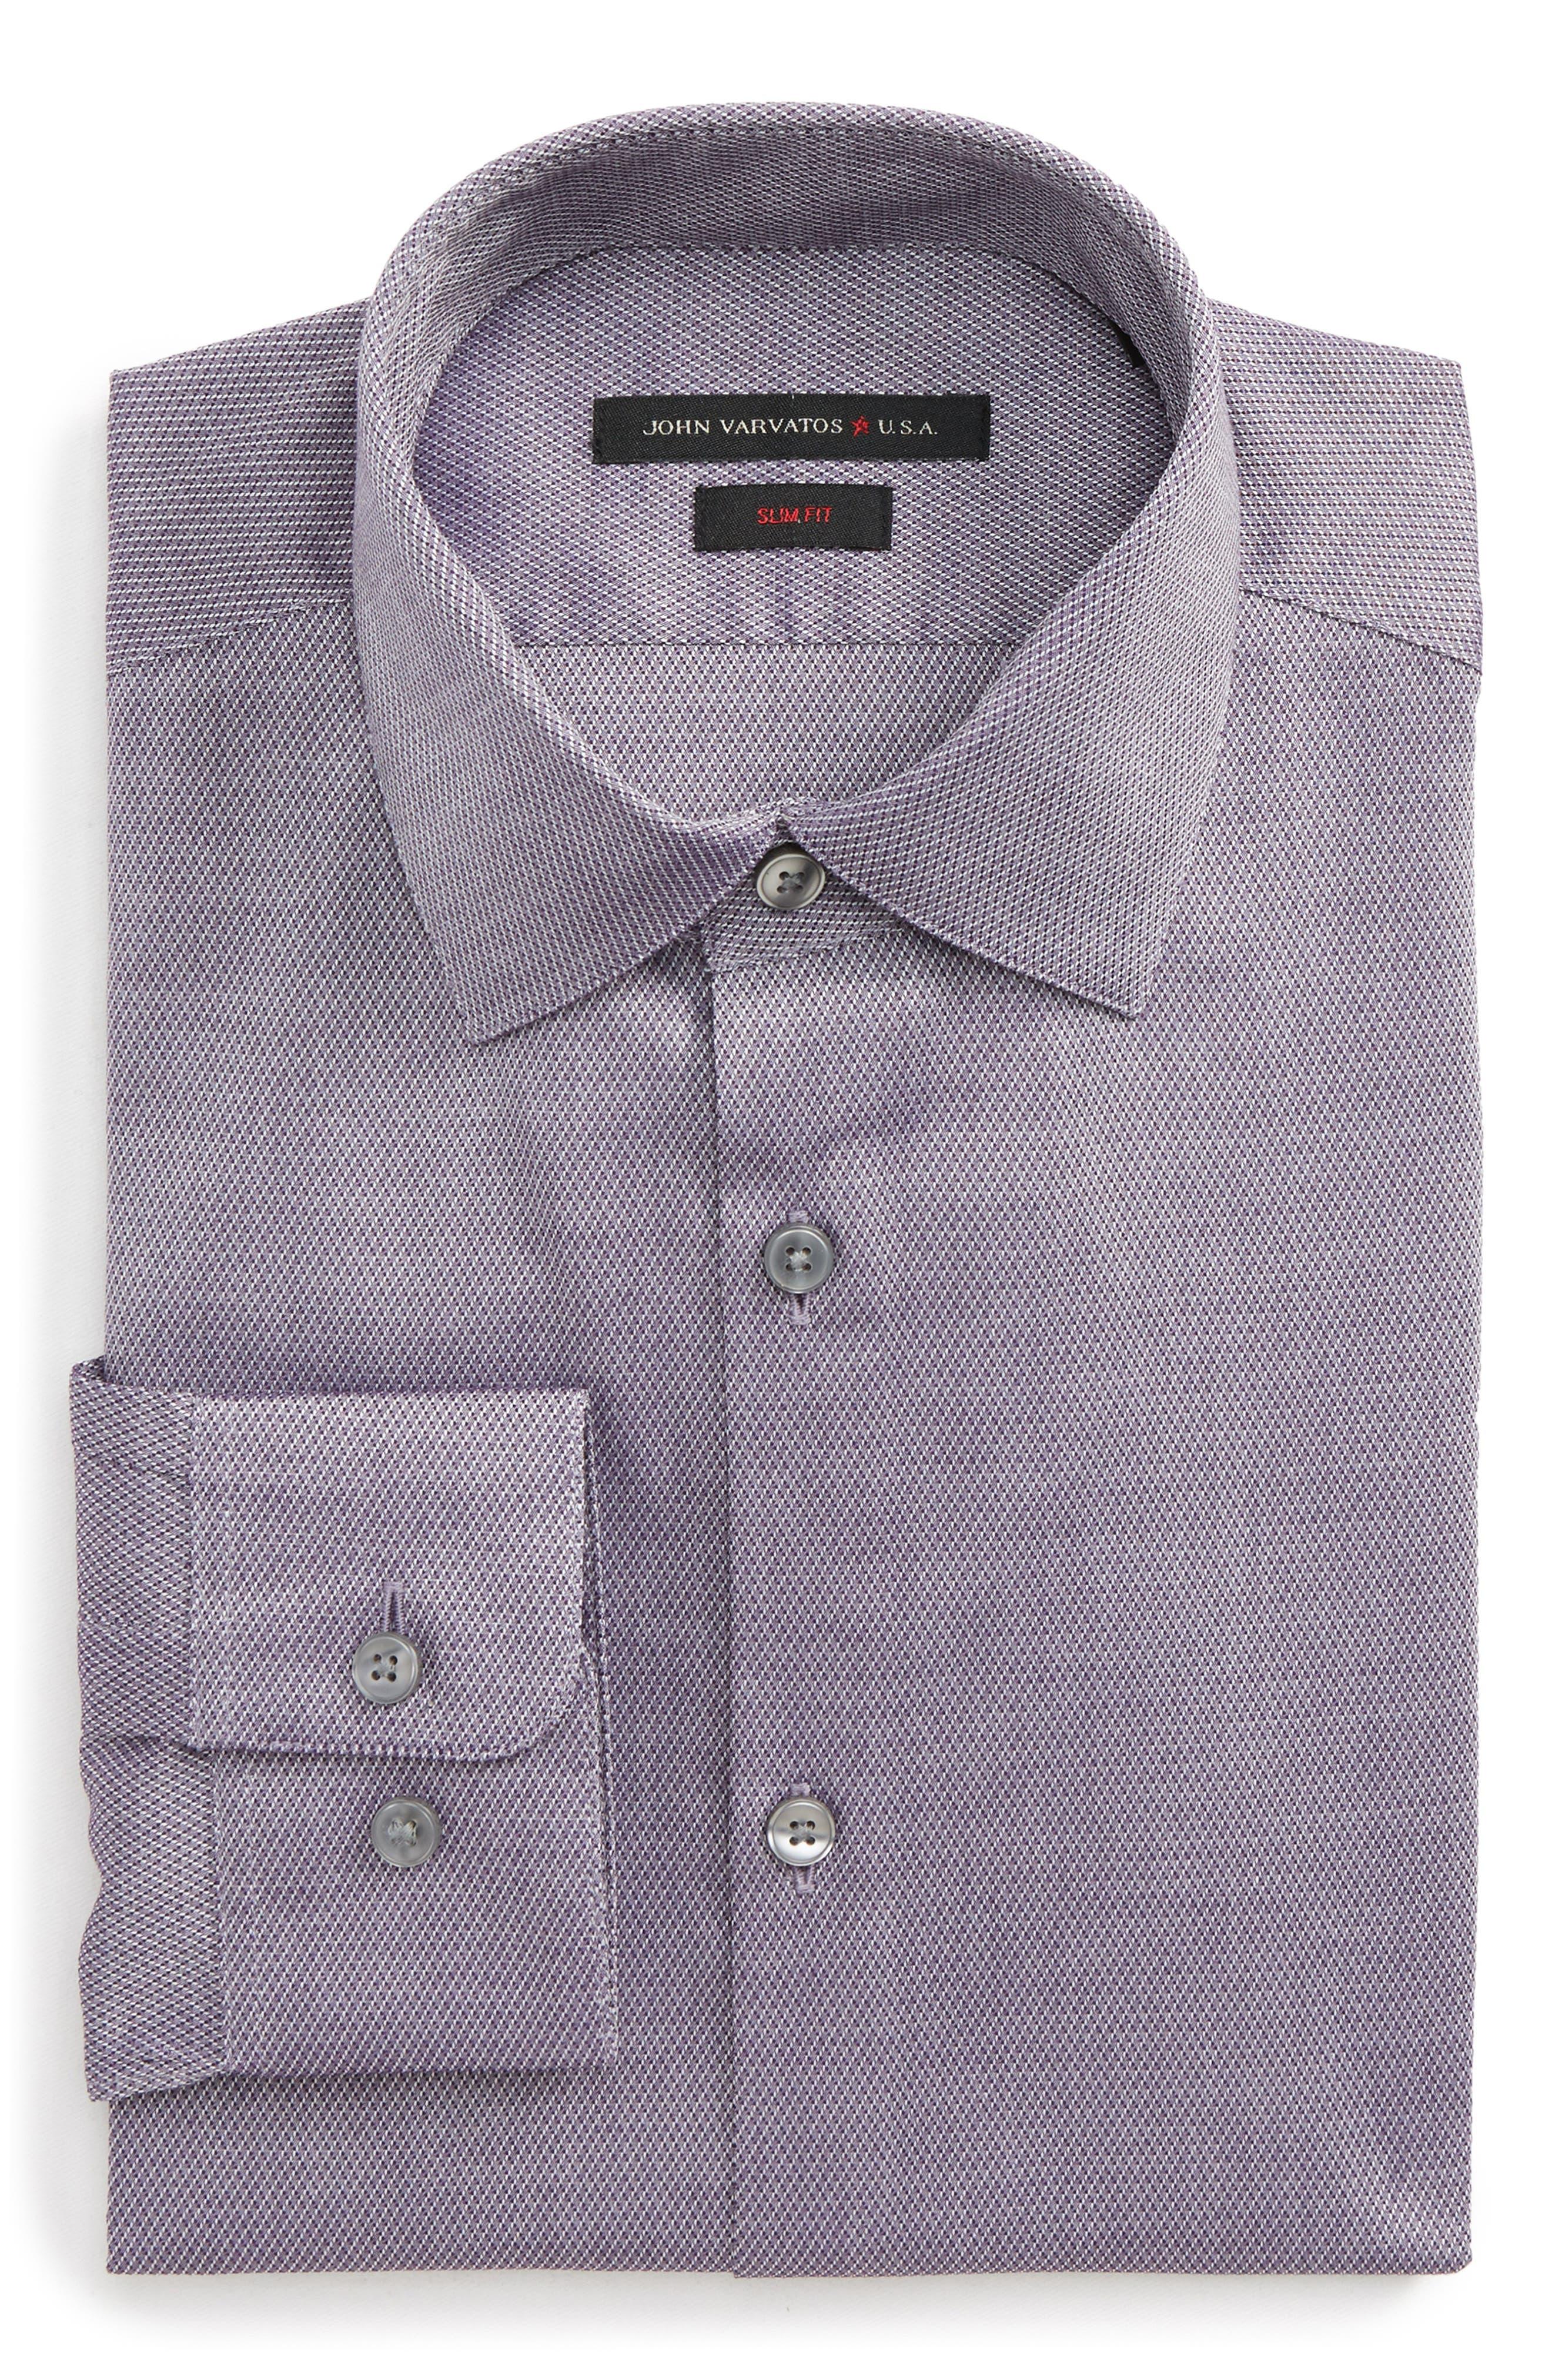 Slim Fit Stretch Geometric Dress Shirt,                             Main thumbnail 1, color,                             Purple